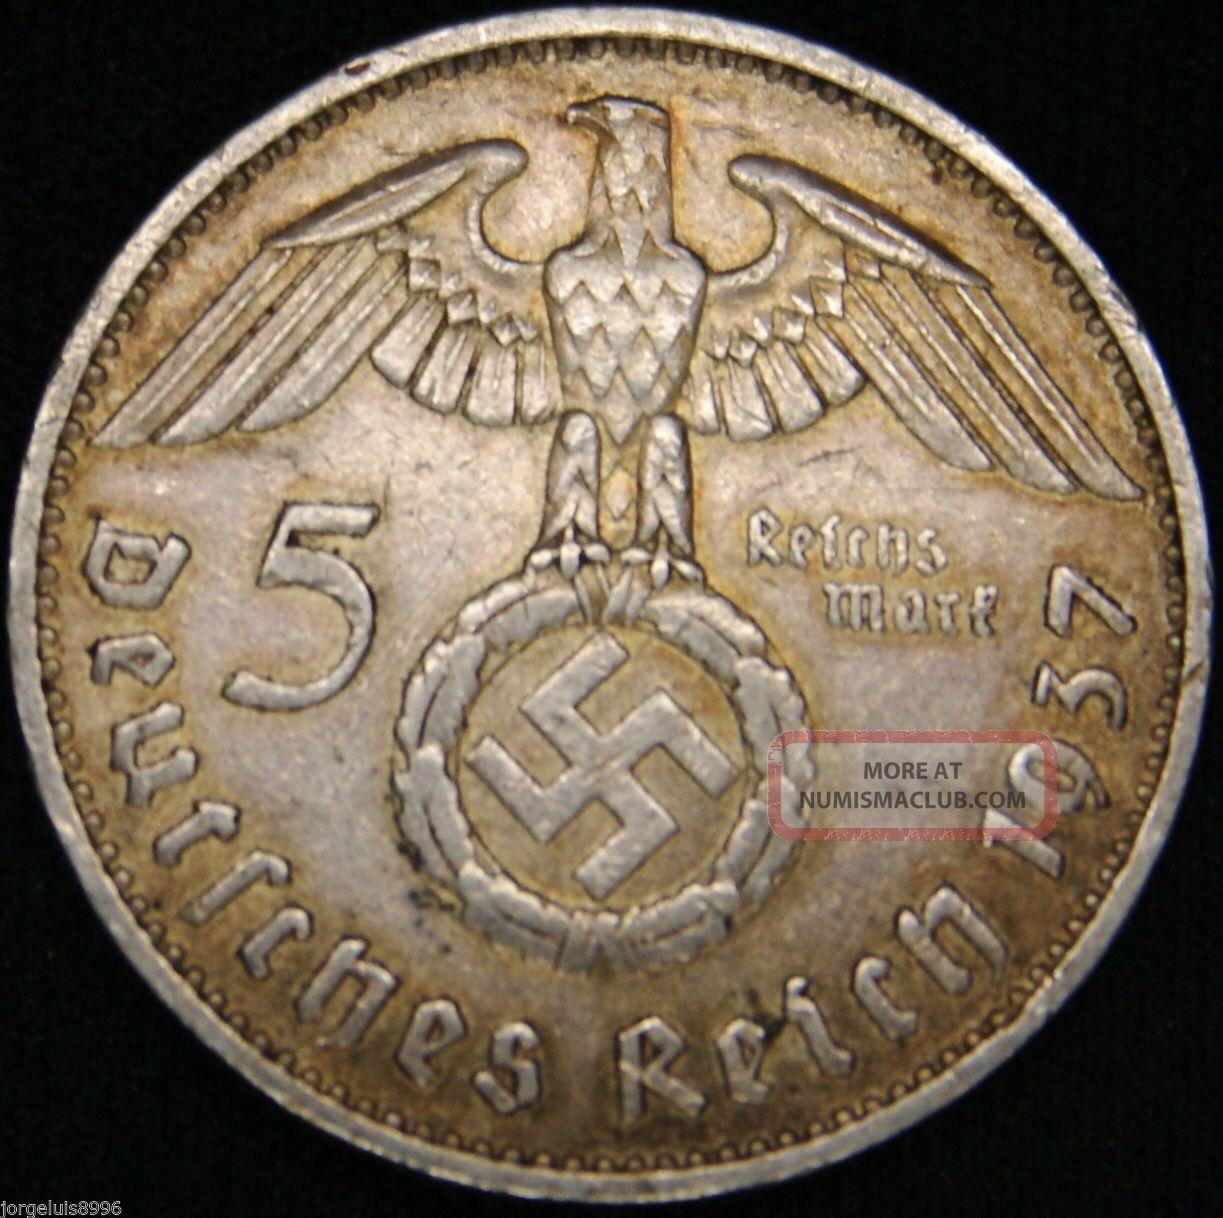 German Nazi Silver Coin 5 Rm 1937 F Big Swastika Germany photo